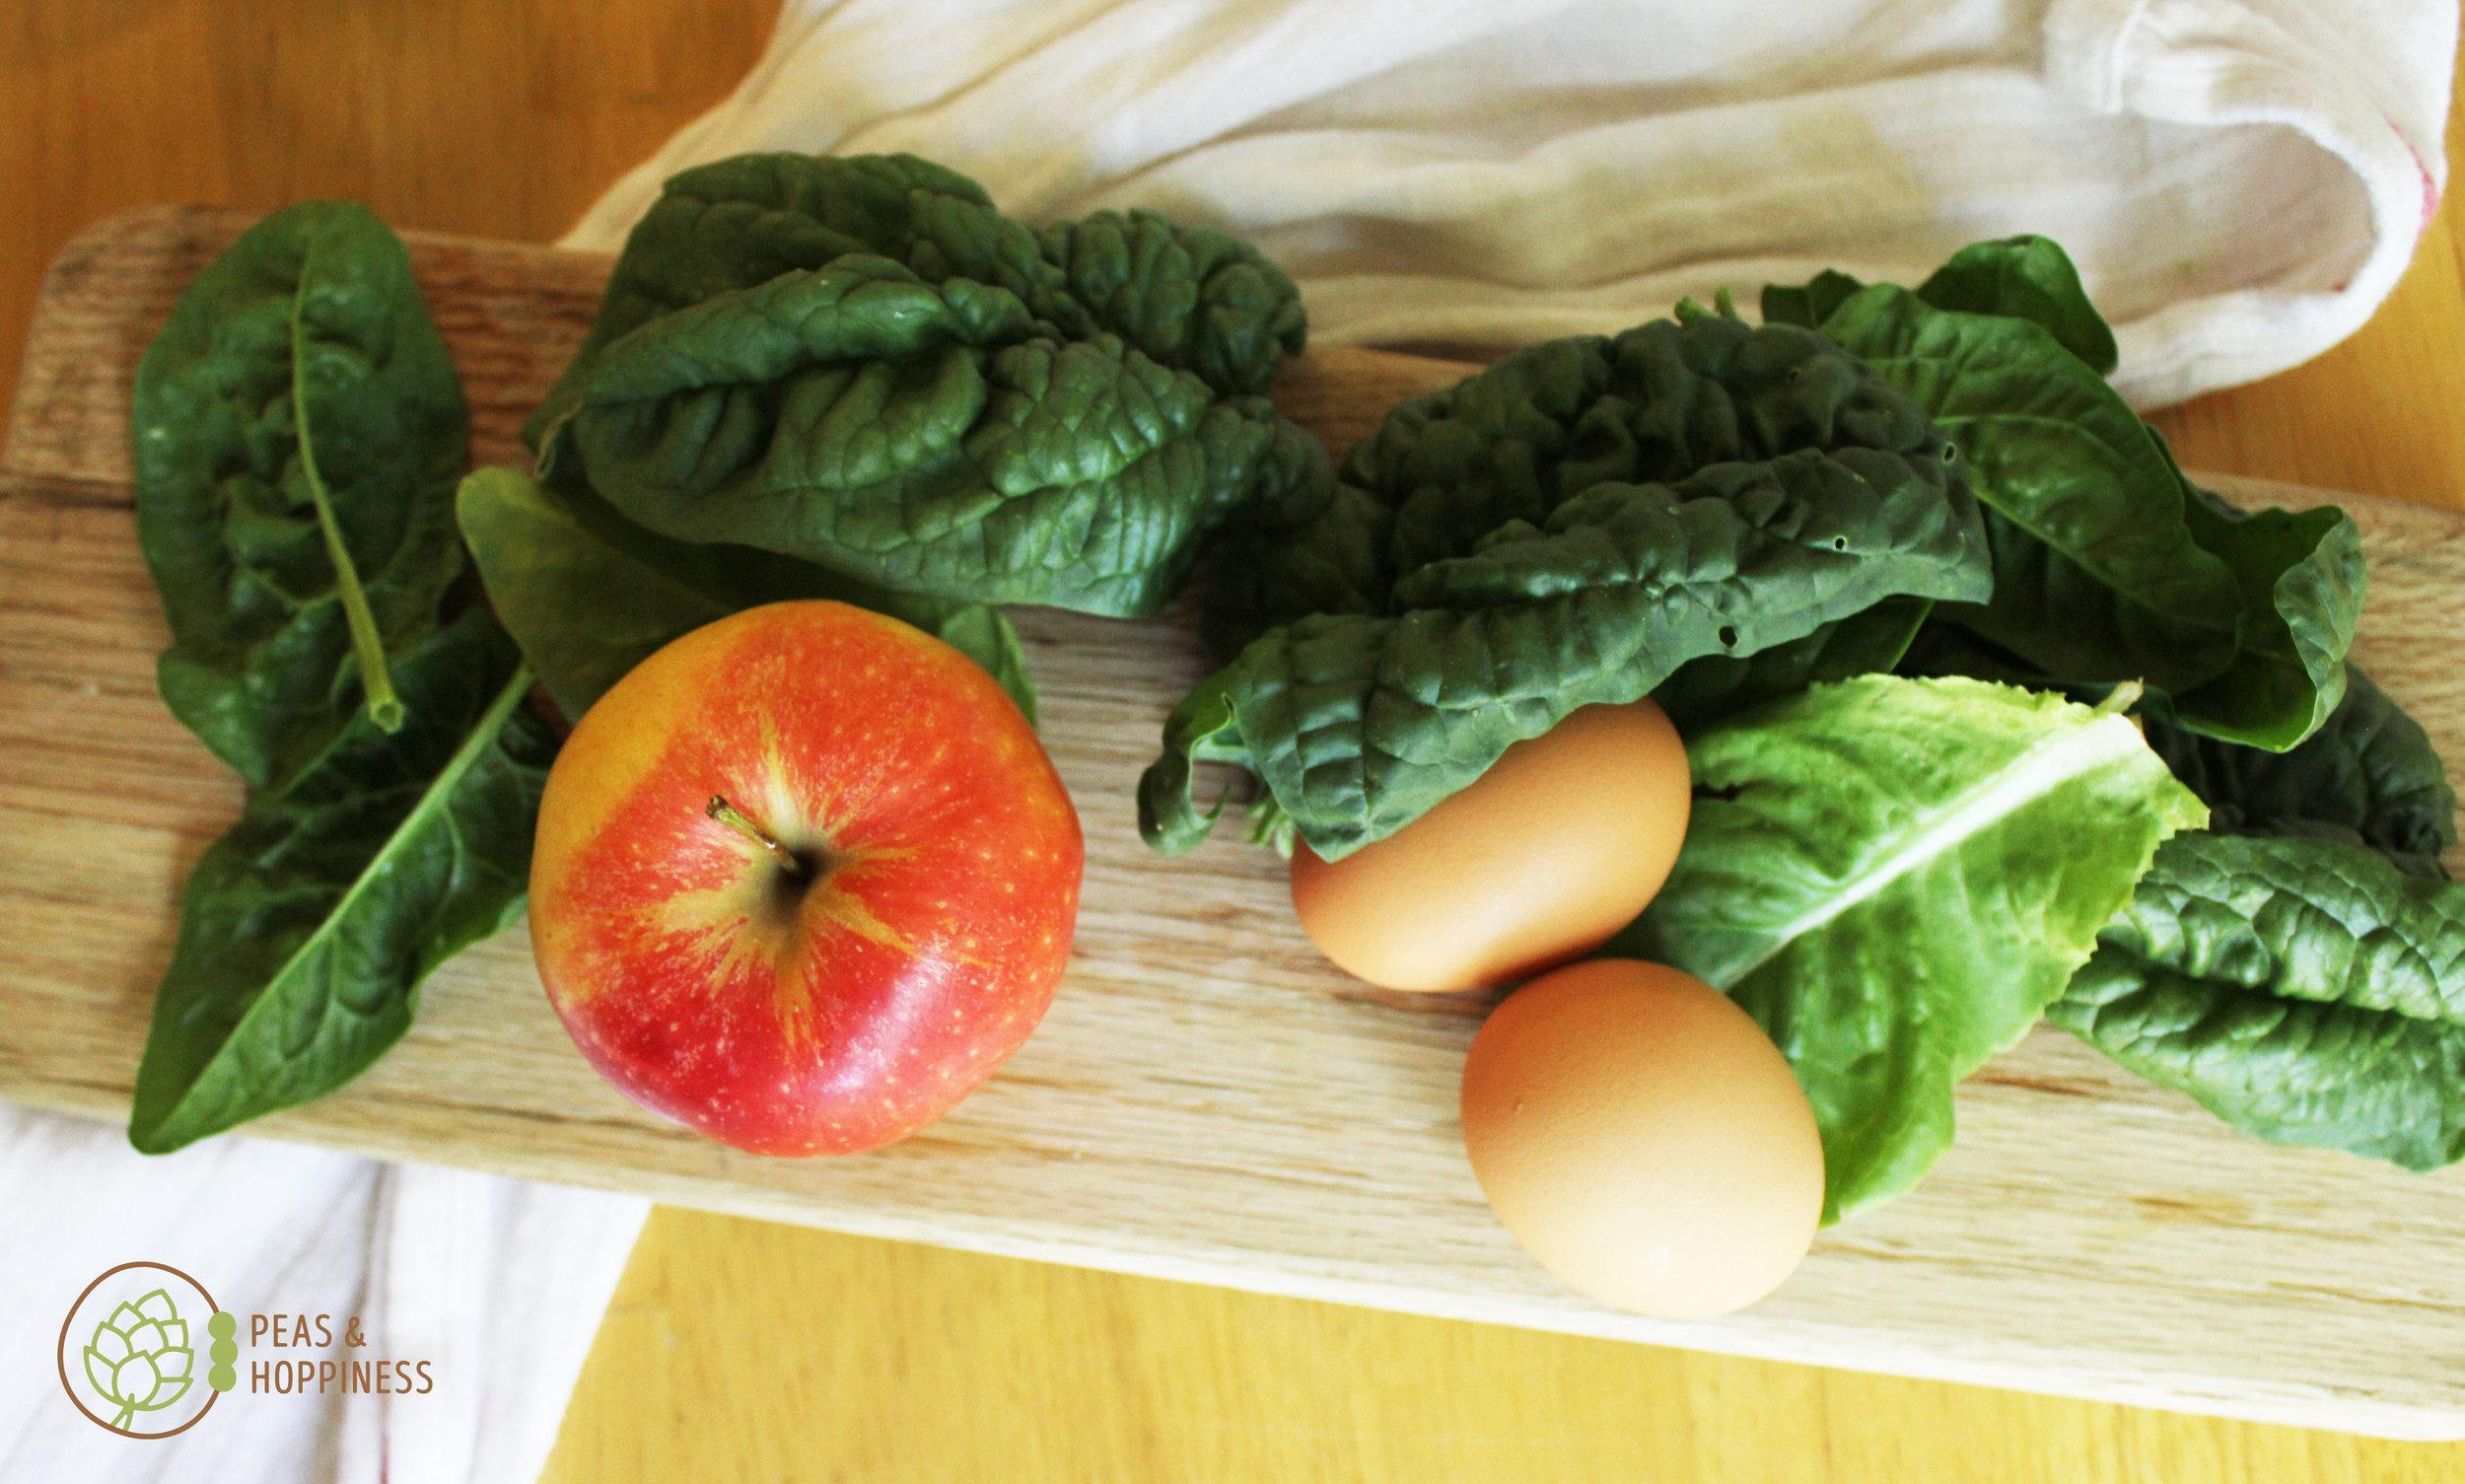 Lunch idea: hard boiled eggs + apple + spinach salad